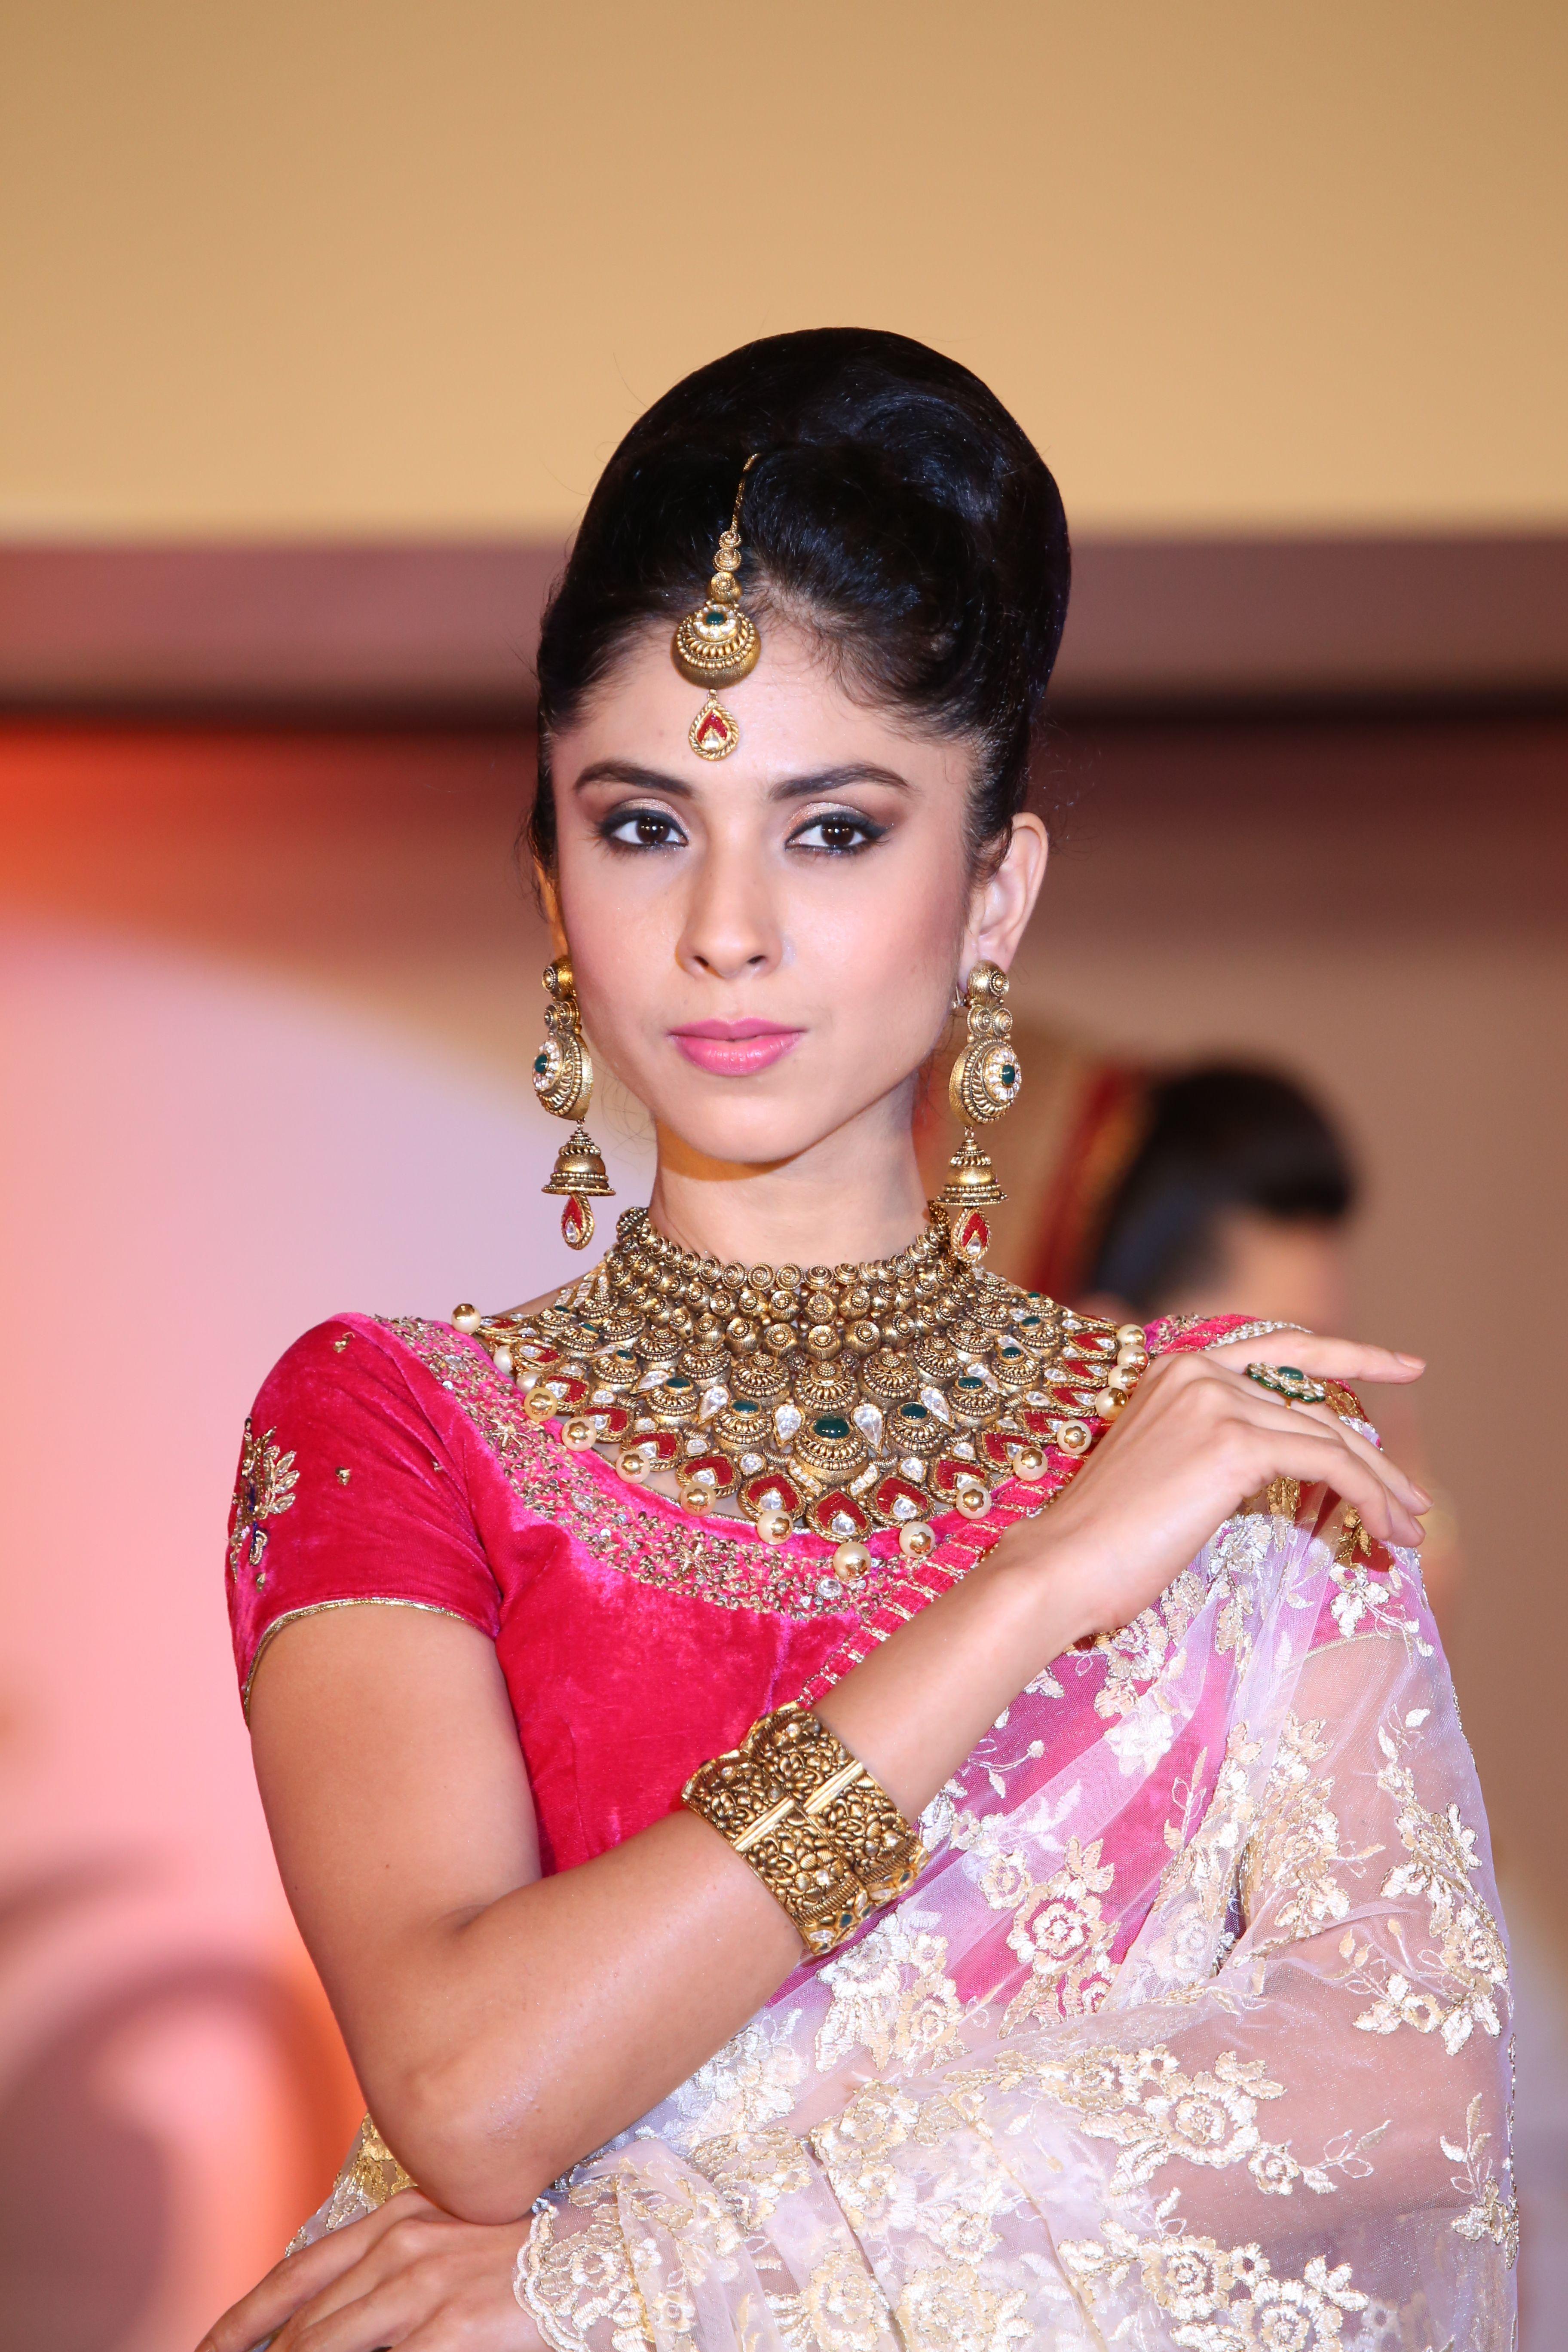 Wedding collection | Rajkot - Fashion show | Pinterest